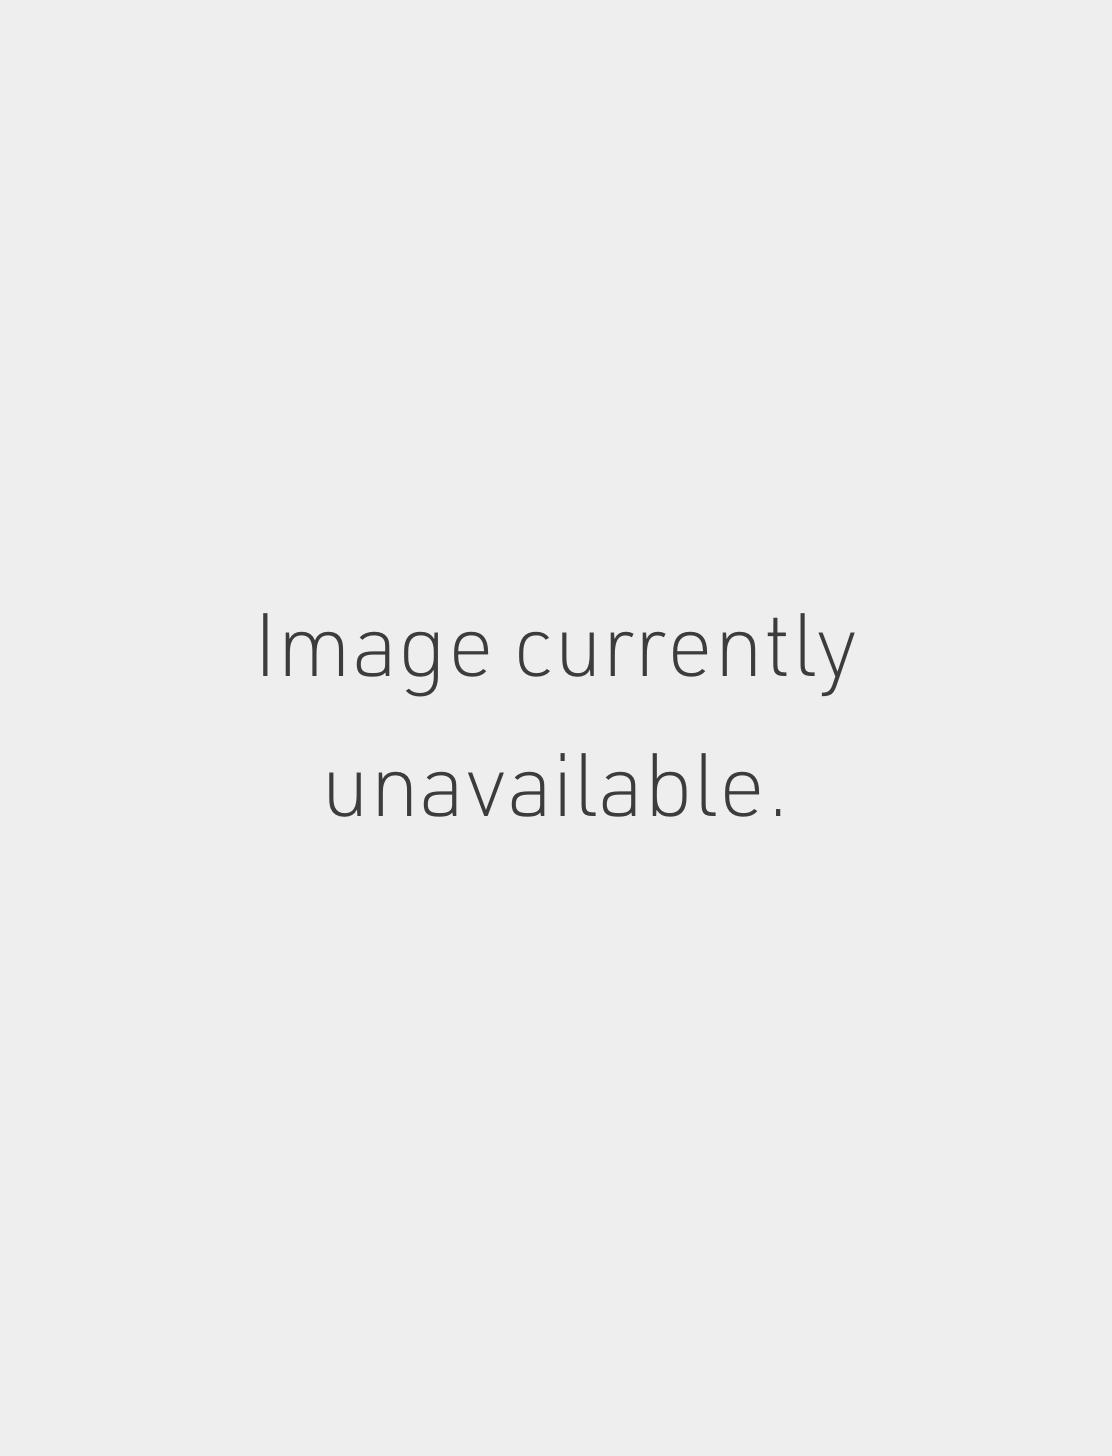 d2c8cbf4b ... 2mm Diamond Princess Ring WHITE GOLD Image #2. View Fullscreen